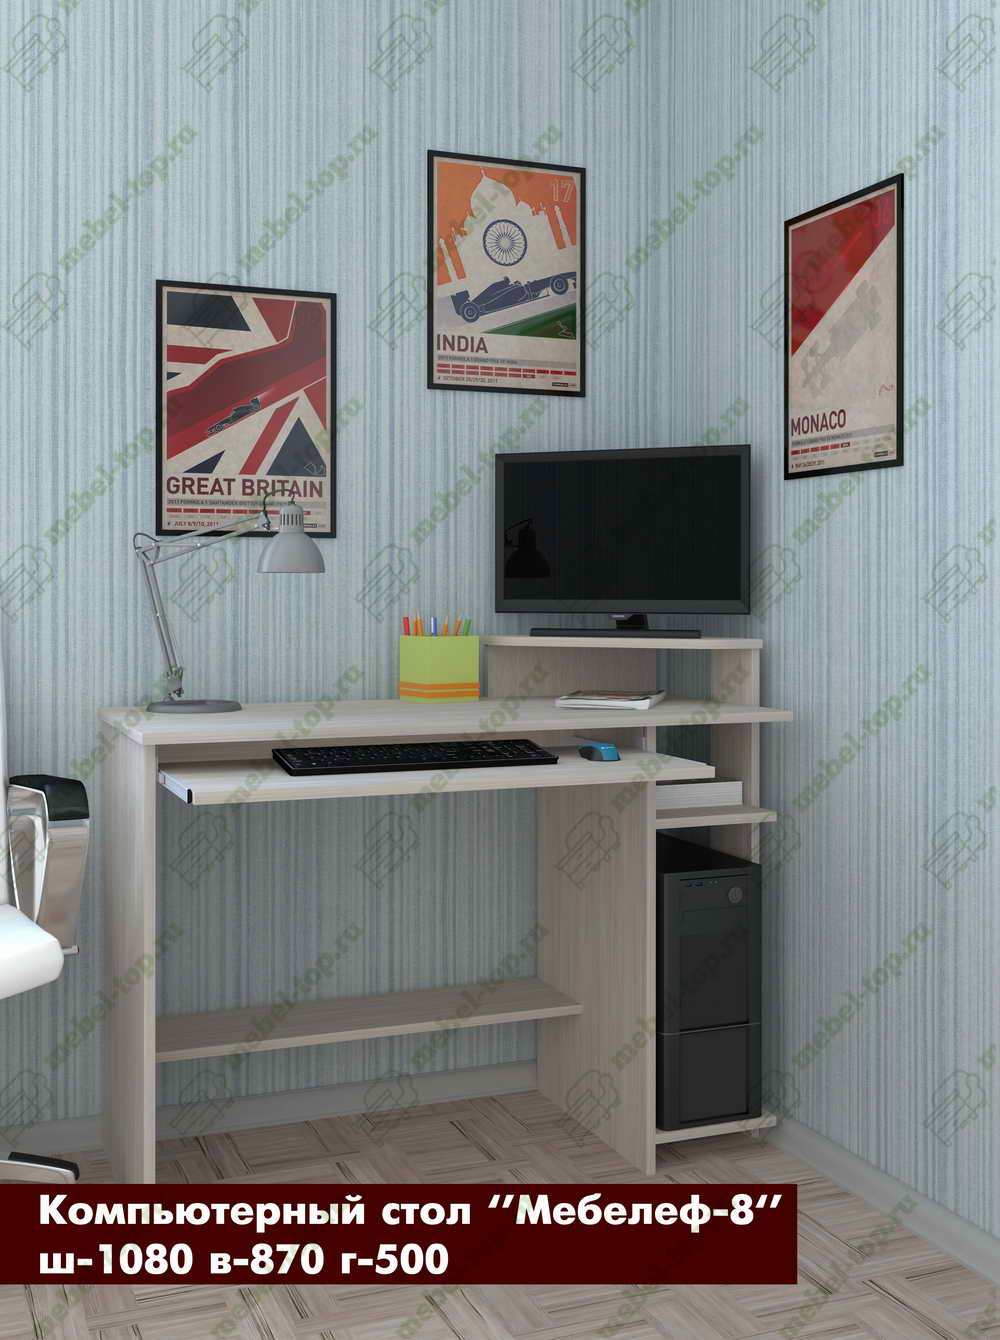 Компьютерный стол Мебелеф-8 стенка мебелеф 5